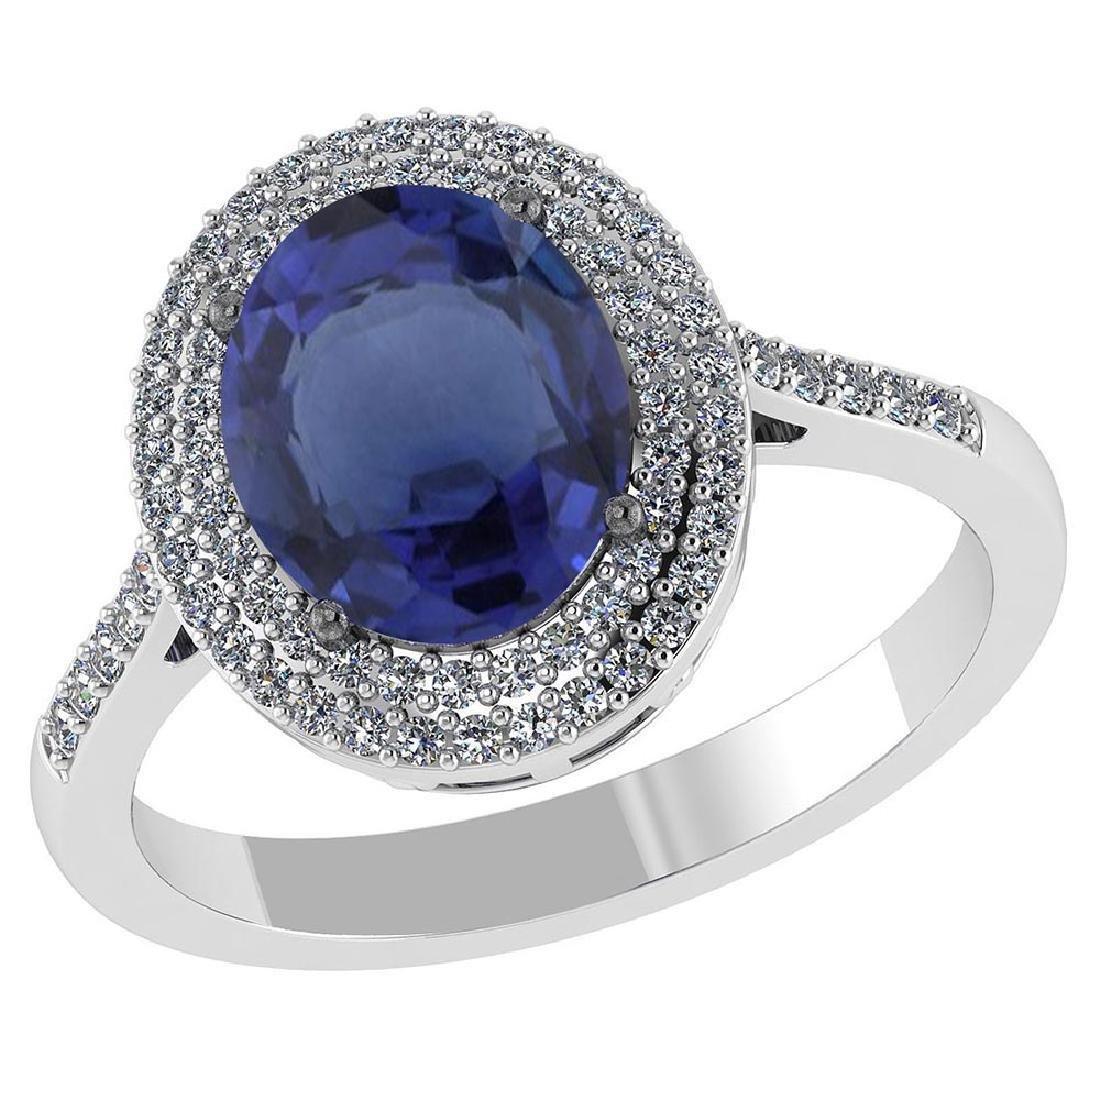 Certified 2.82 CTW Genuine Blue Sapphire And Diamond 14